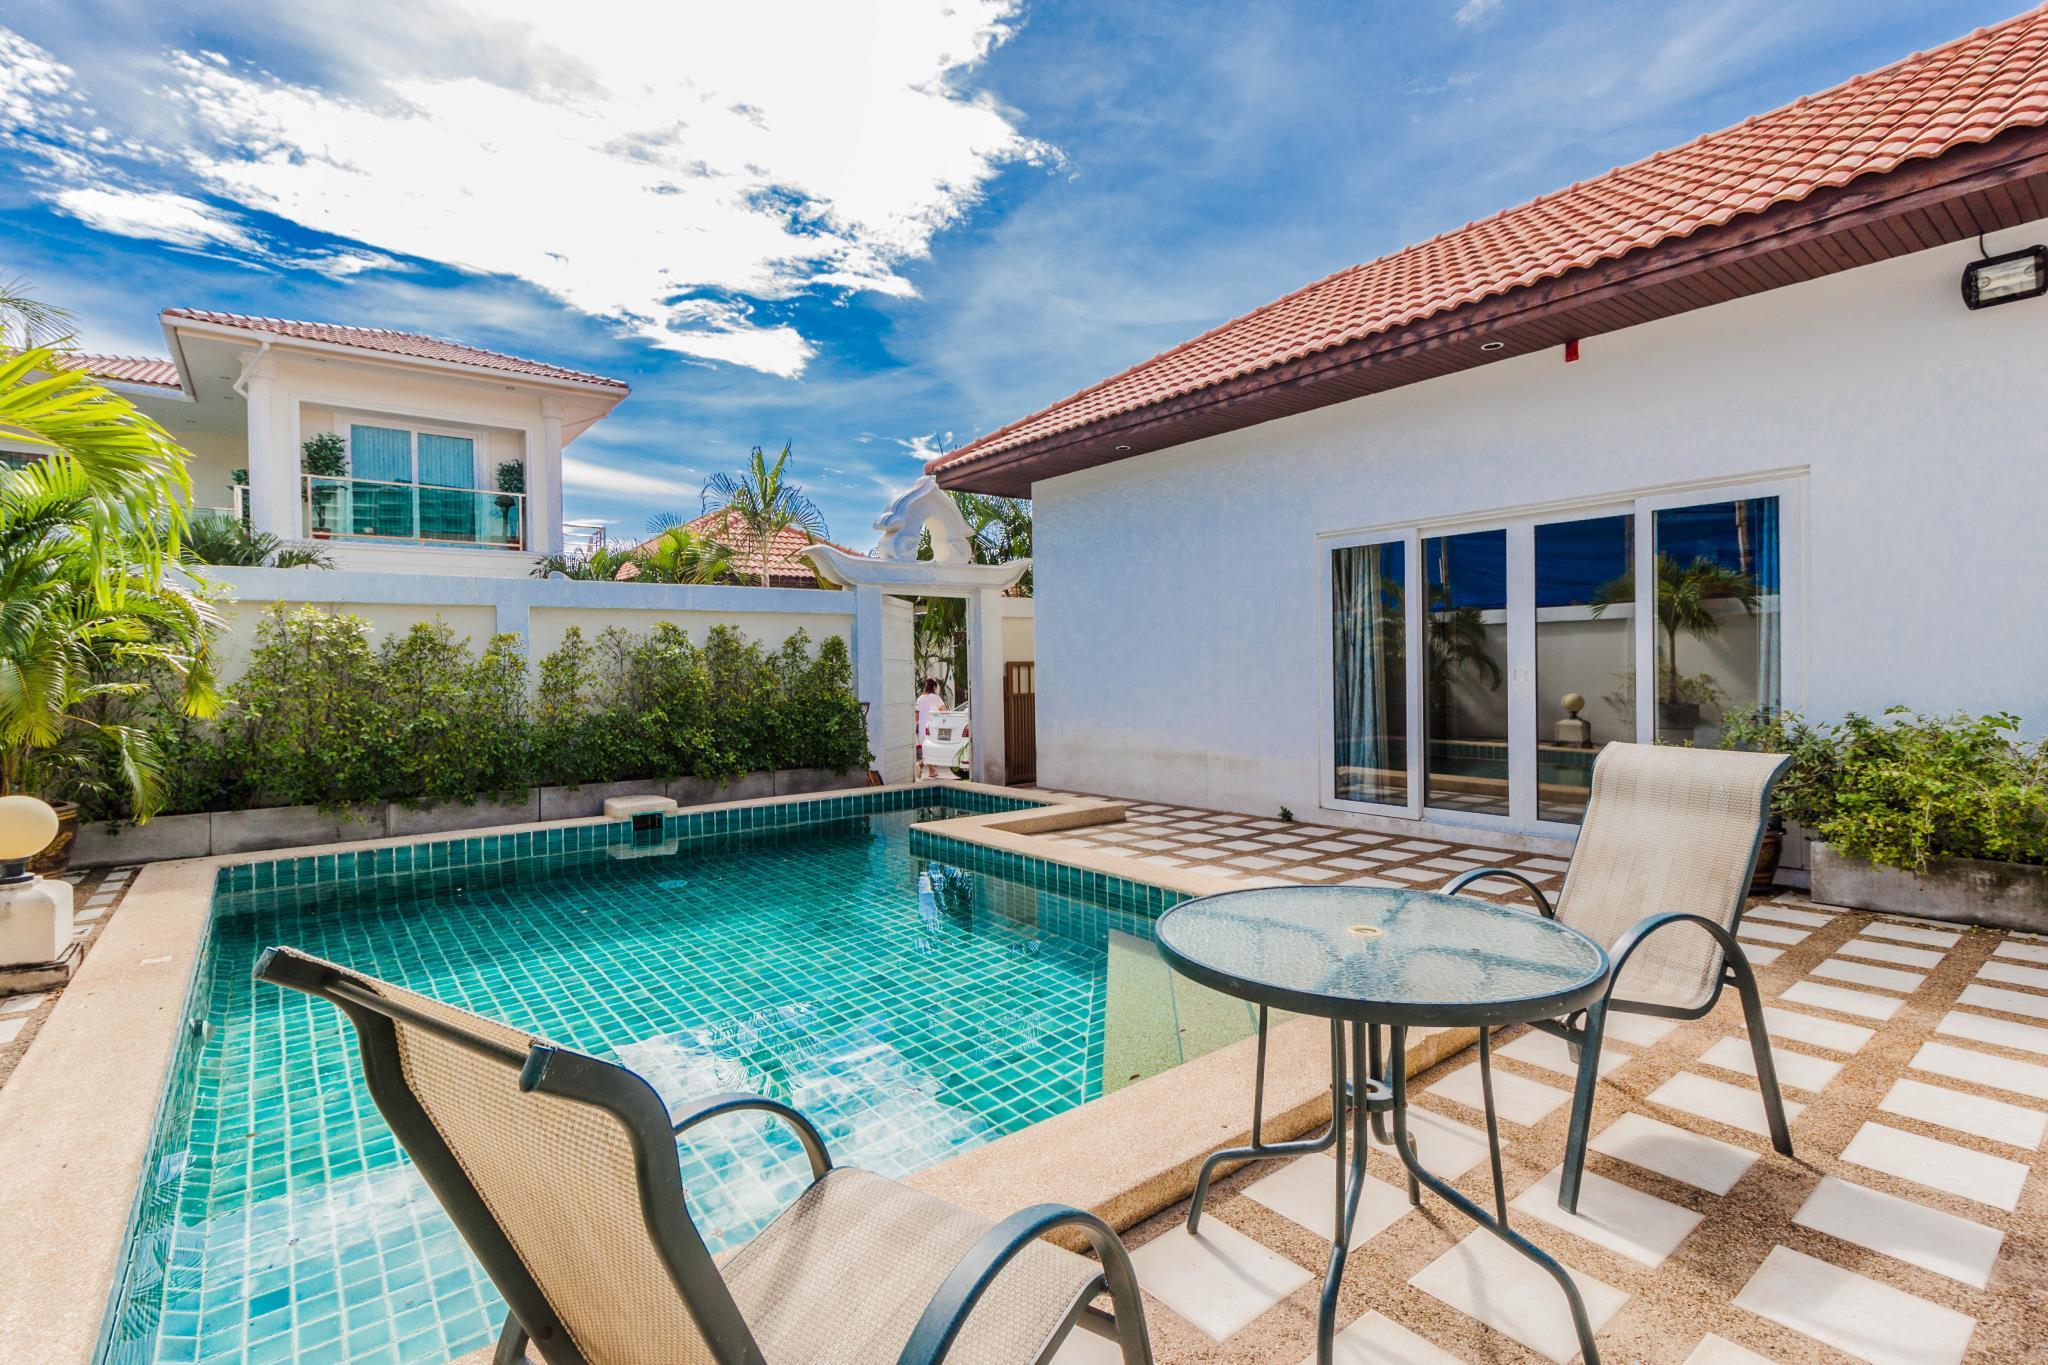 Majestic Pool Villa By Pattaya Sunny Rentals